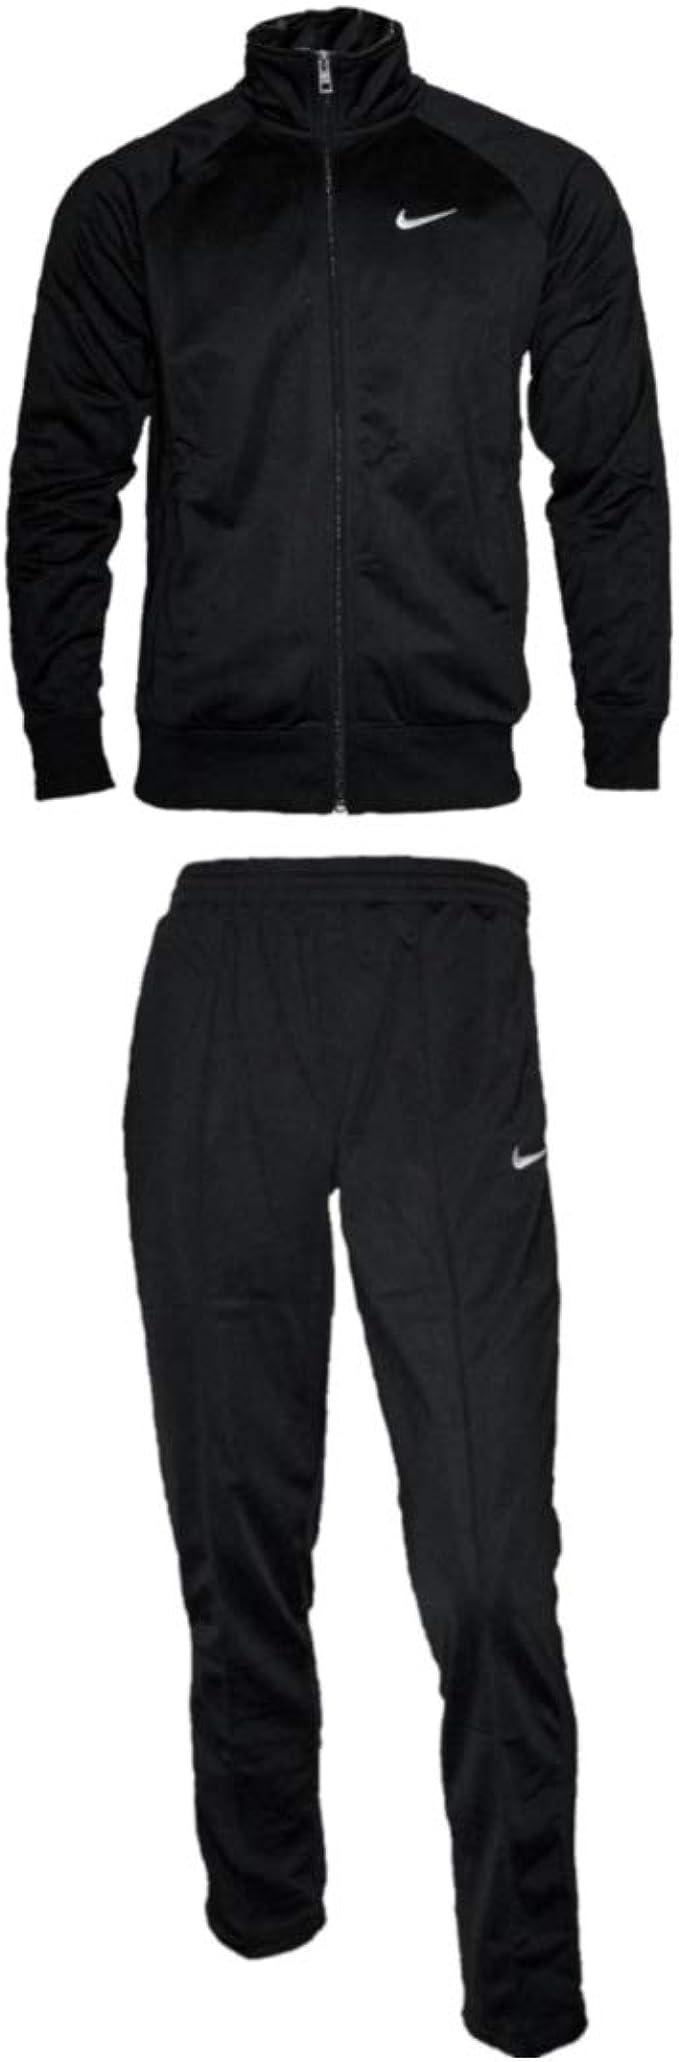 instructor intercambiar ética  Nike Herren Trainingsanzug Schwarz Gr. S: Amazon.de: Bekleidung